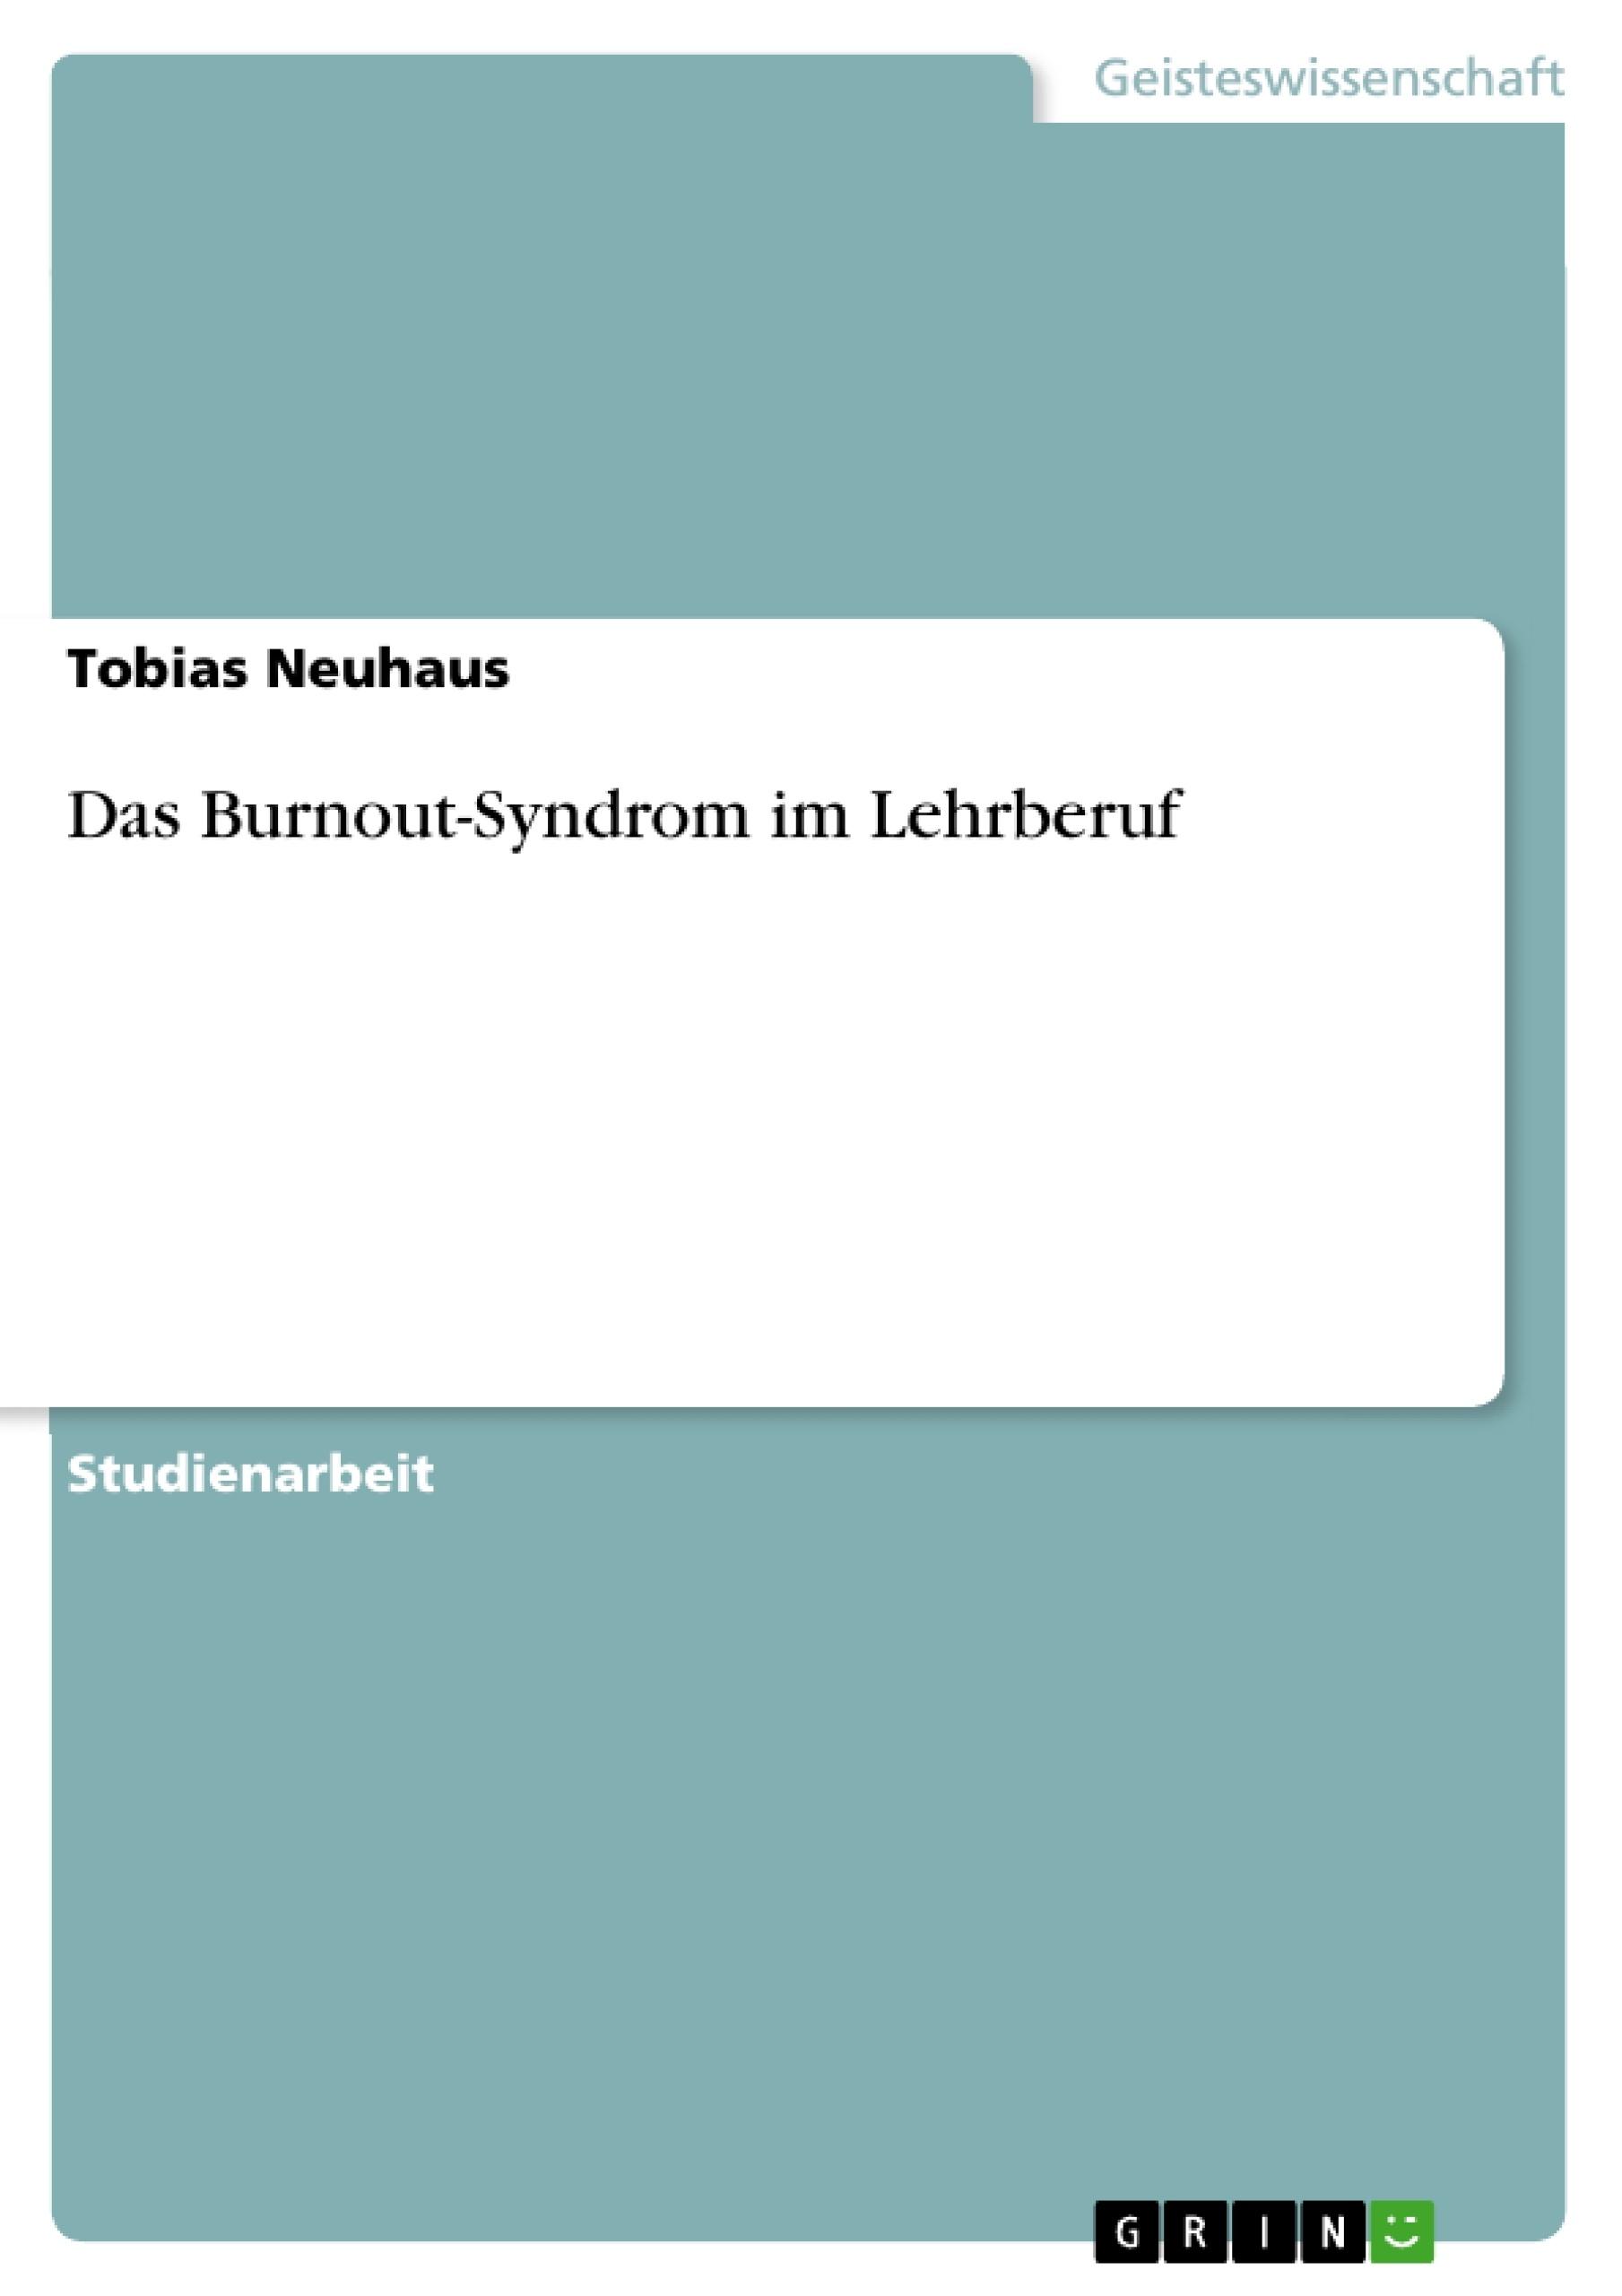 Titel: Das Burnout-Syndrom im Lehrberuf